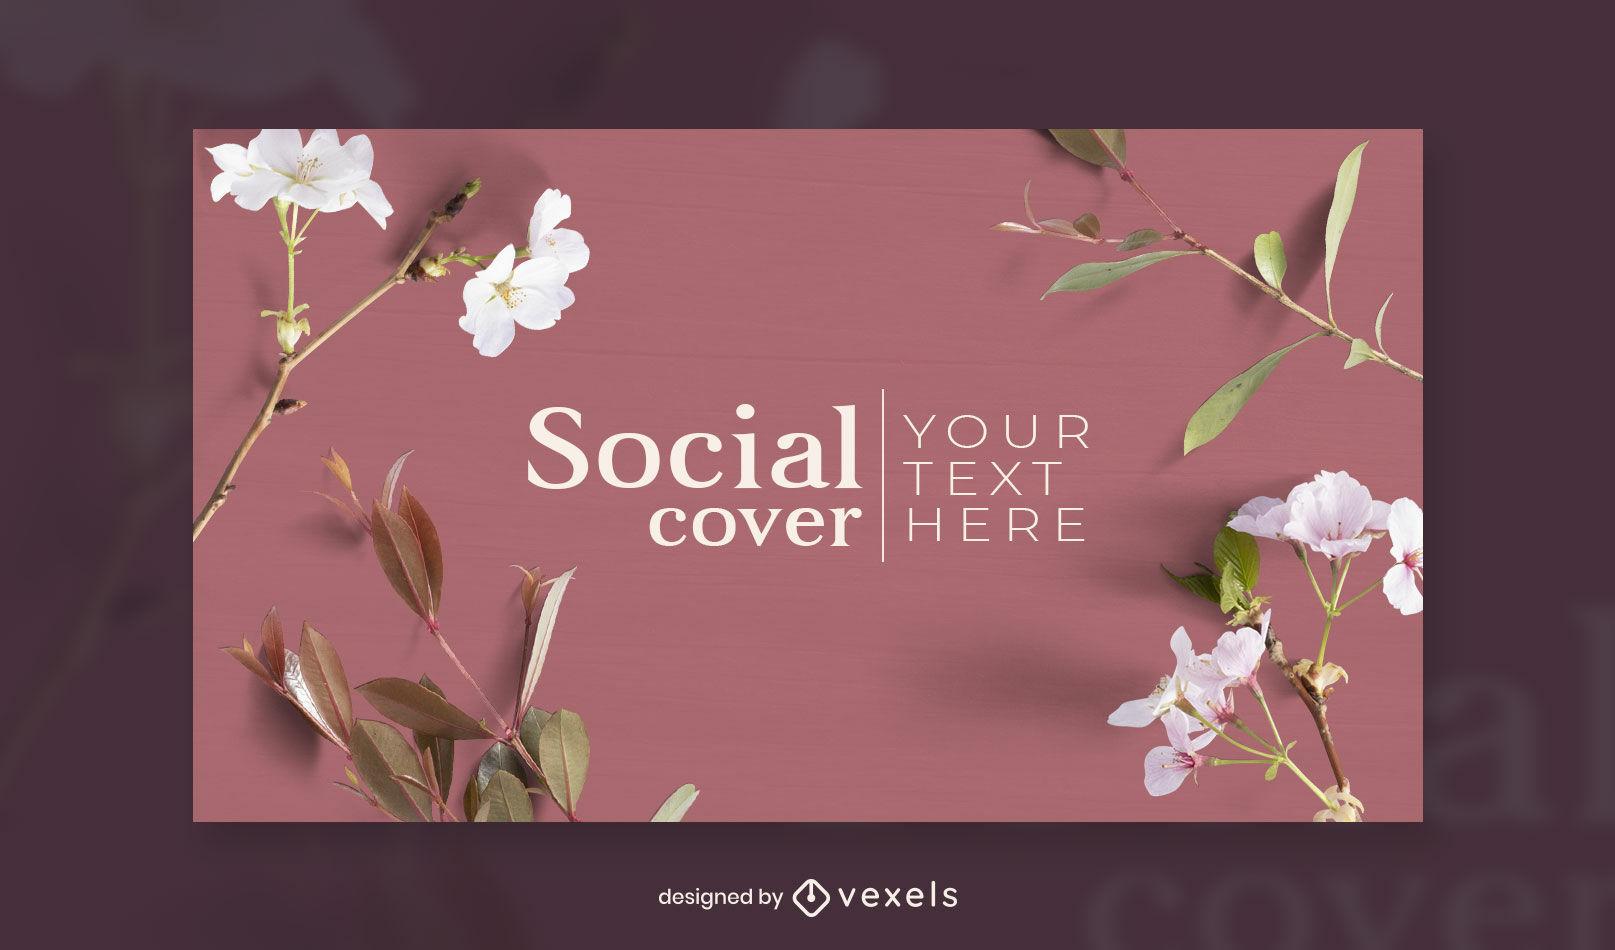 Flowers facebook cover design template